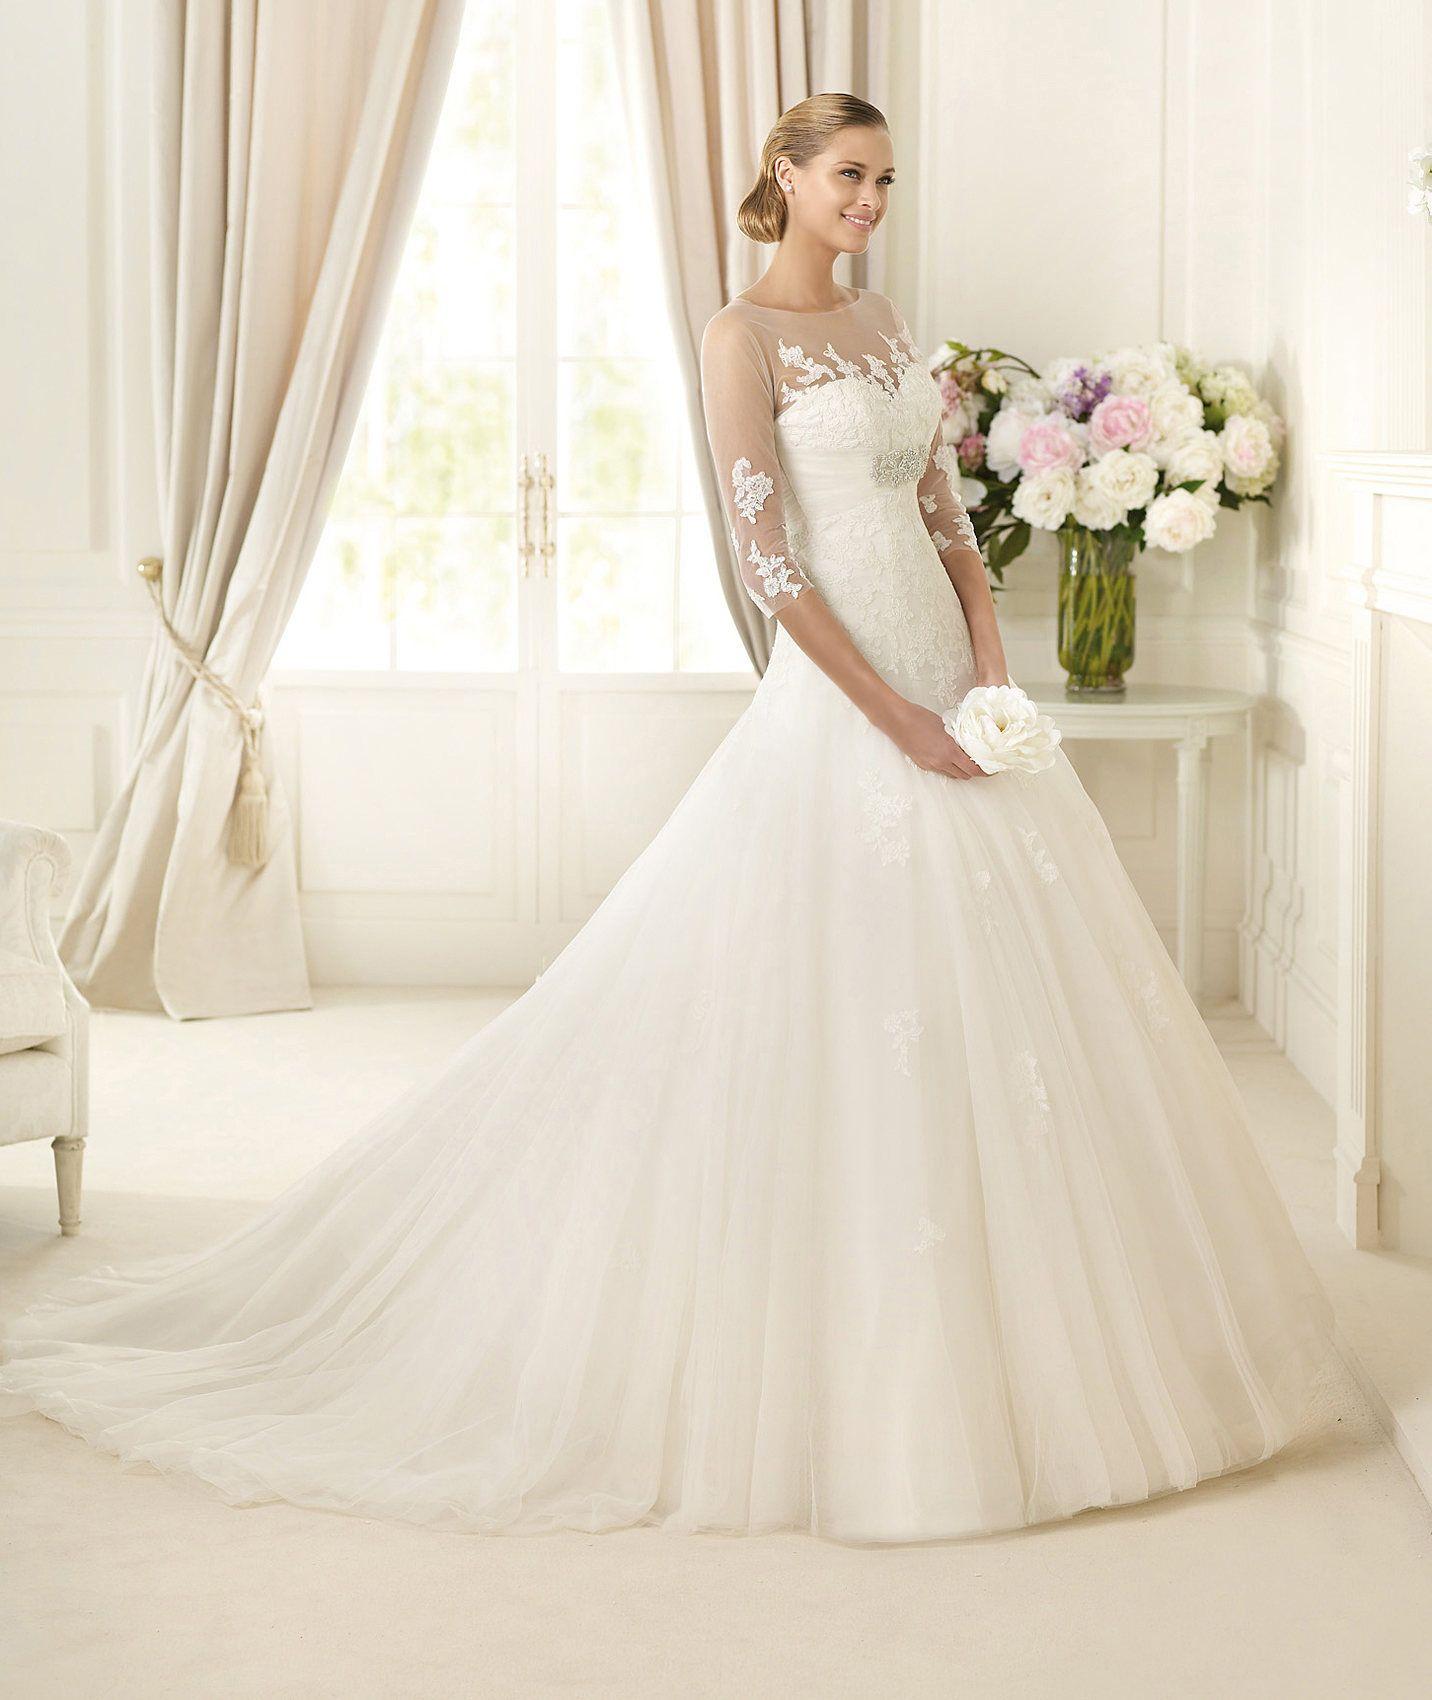 Pronovias | Brautkleider und Festkleider | Pronovias- Wedding ...